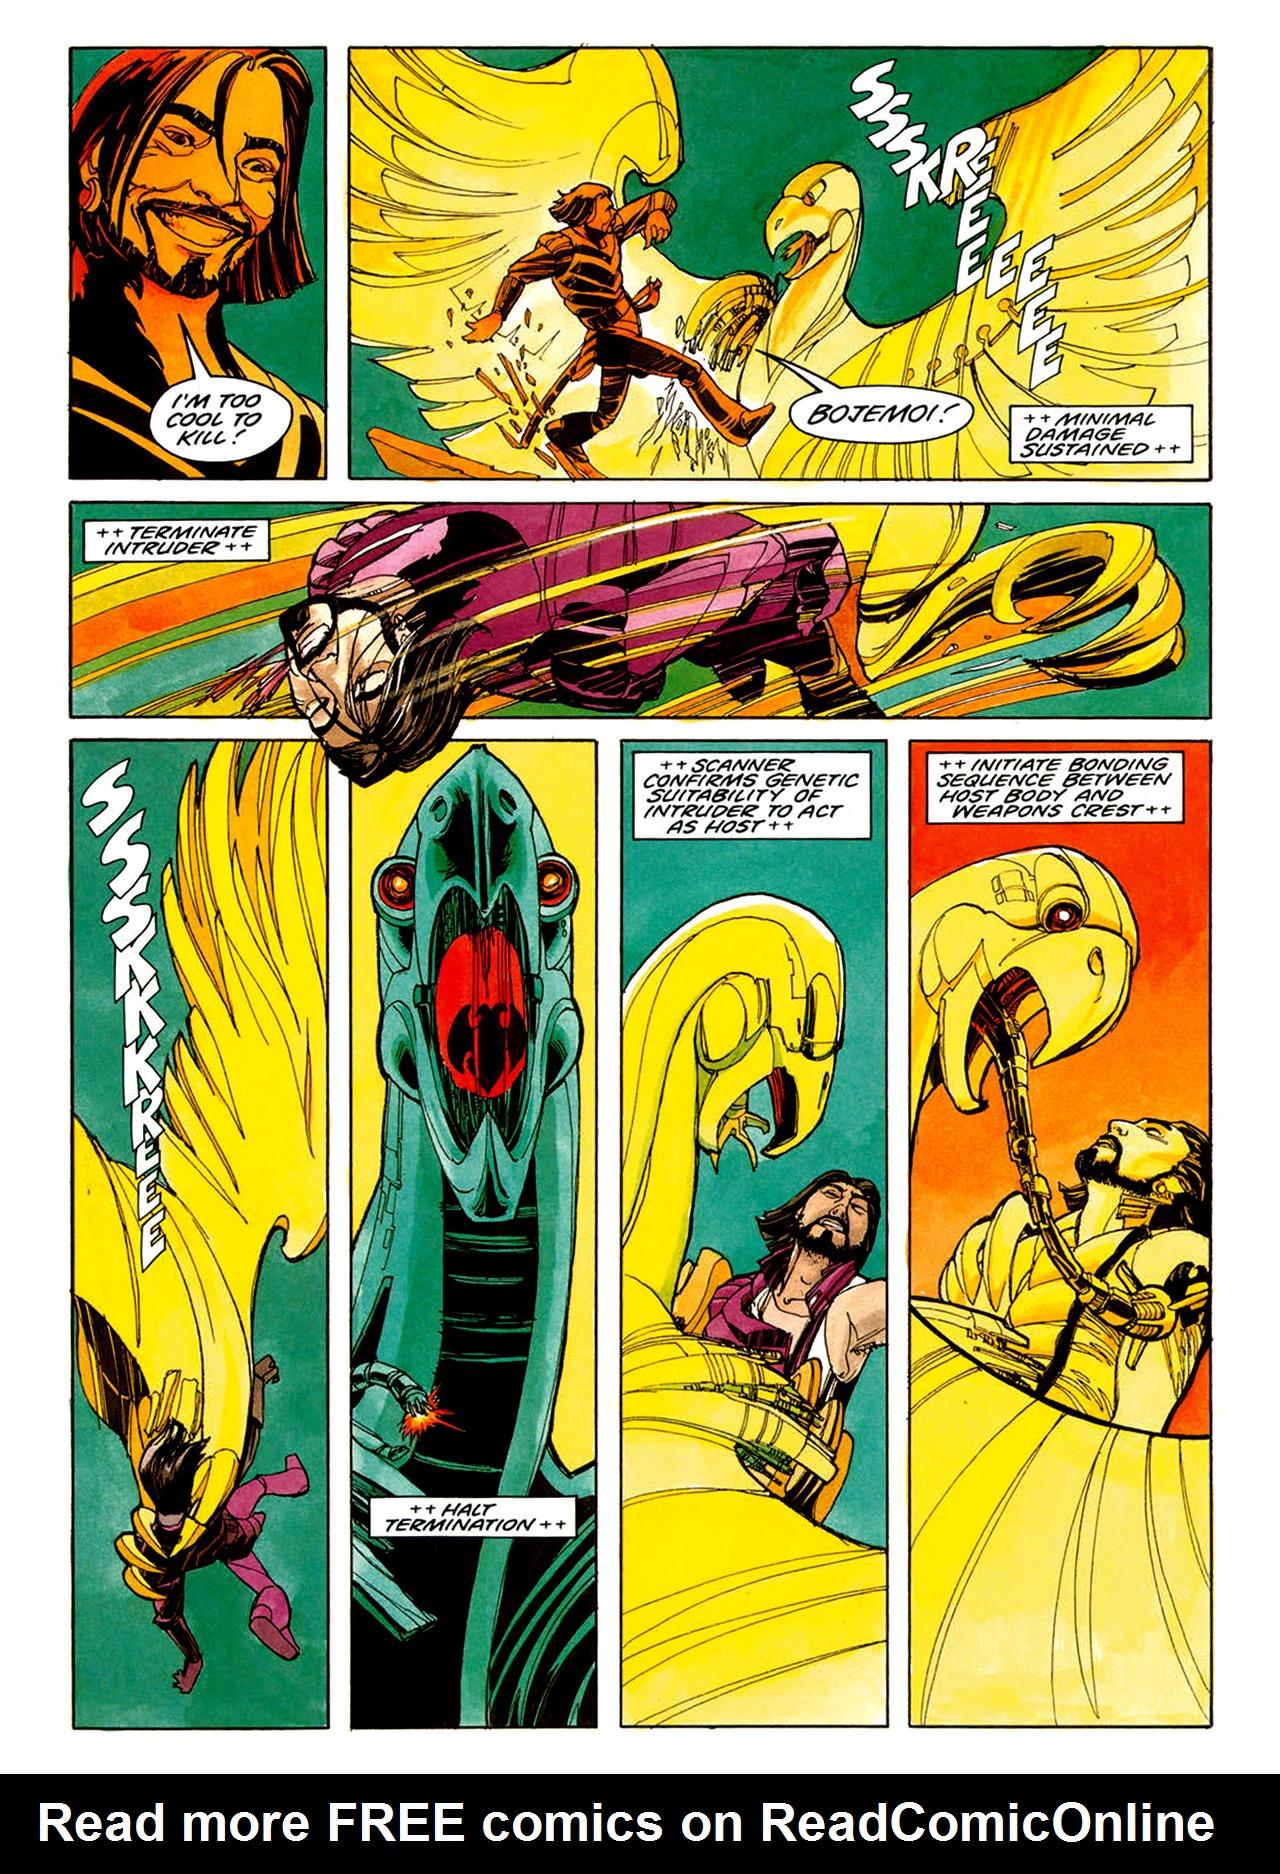 Read online Nikolai Dante comic -  Issue # TPB 1 - 24